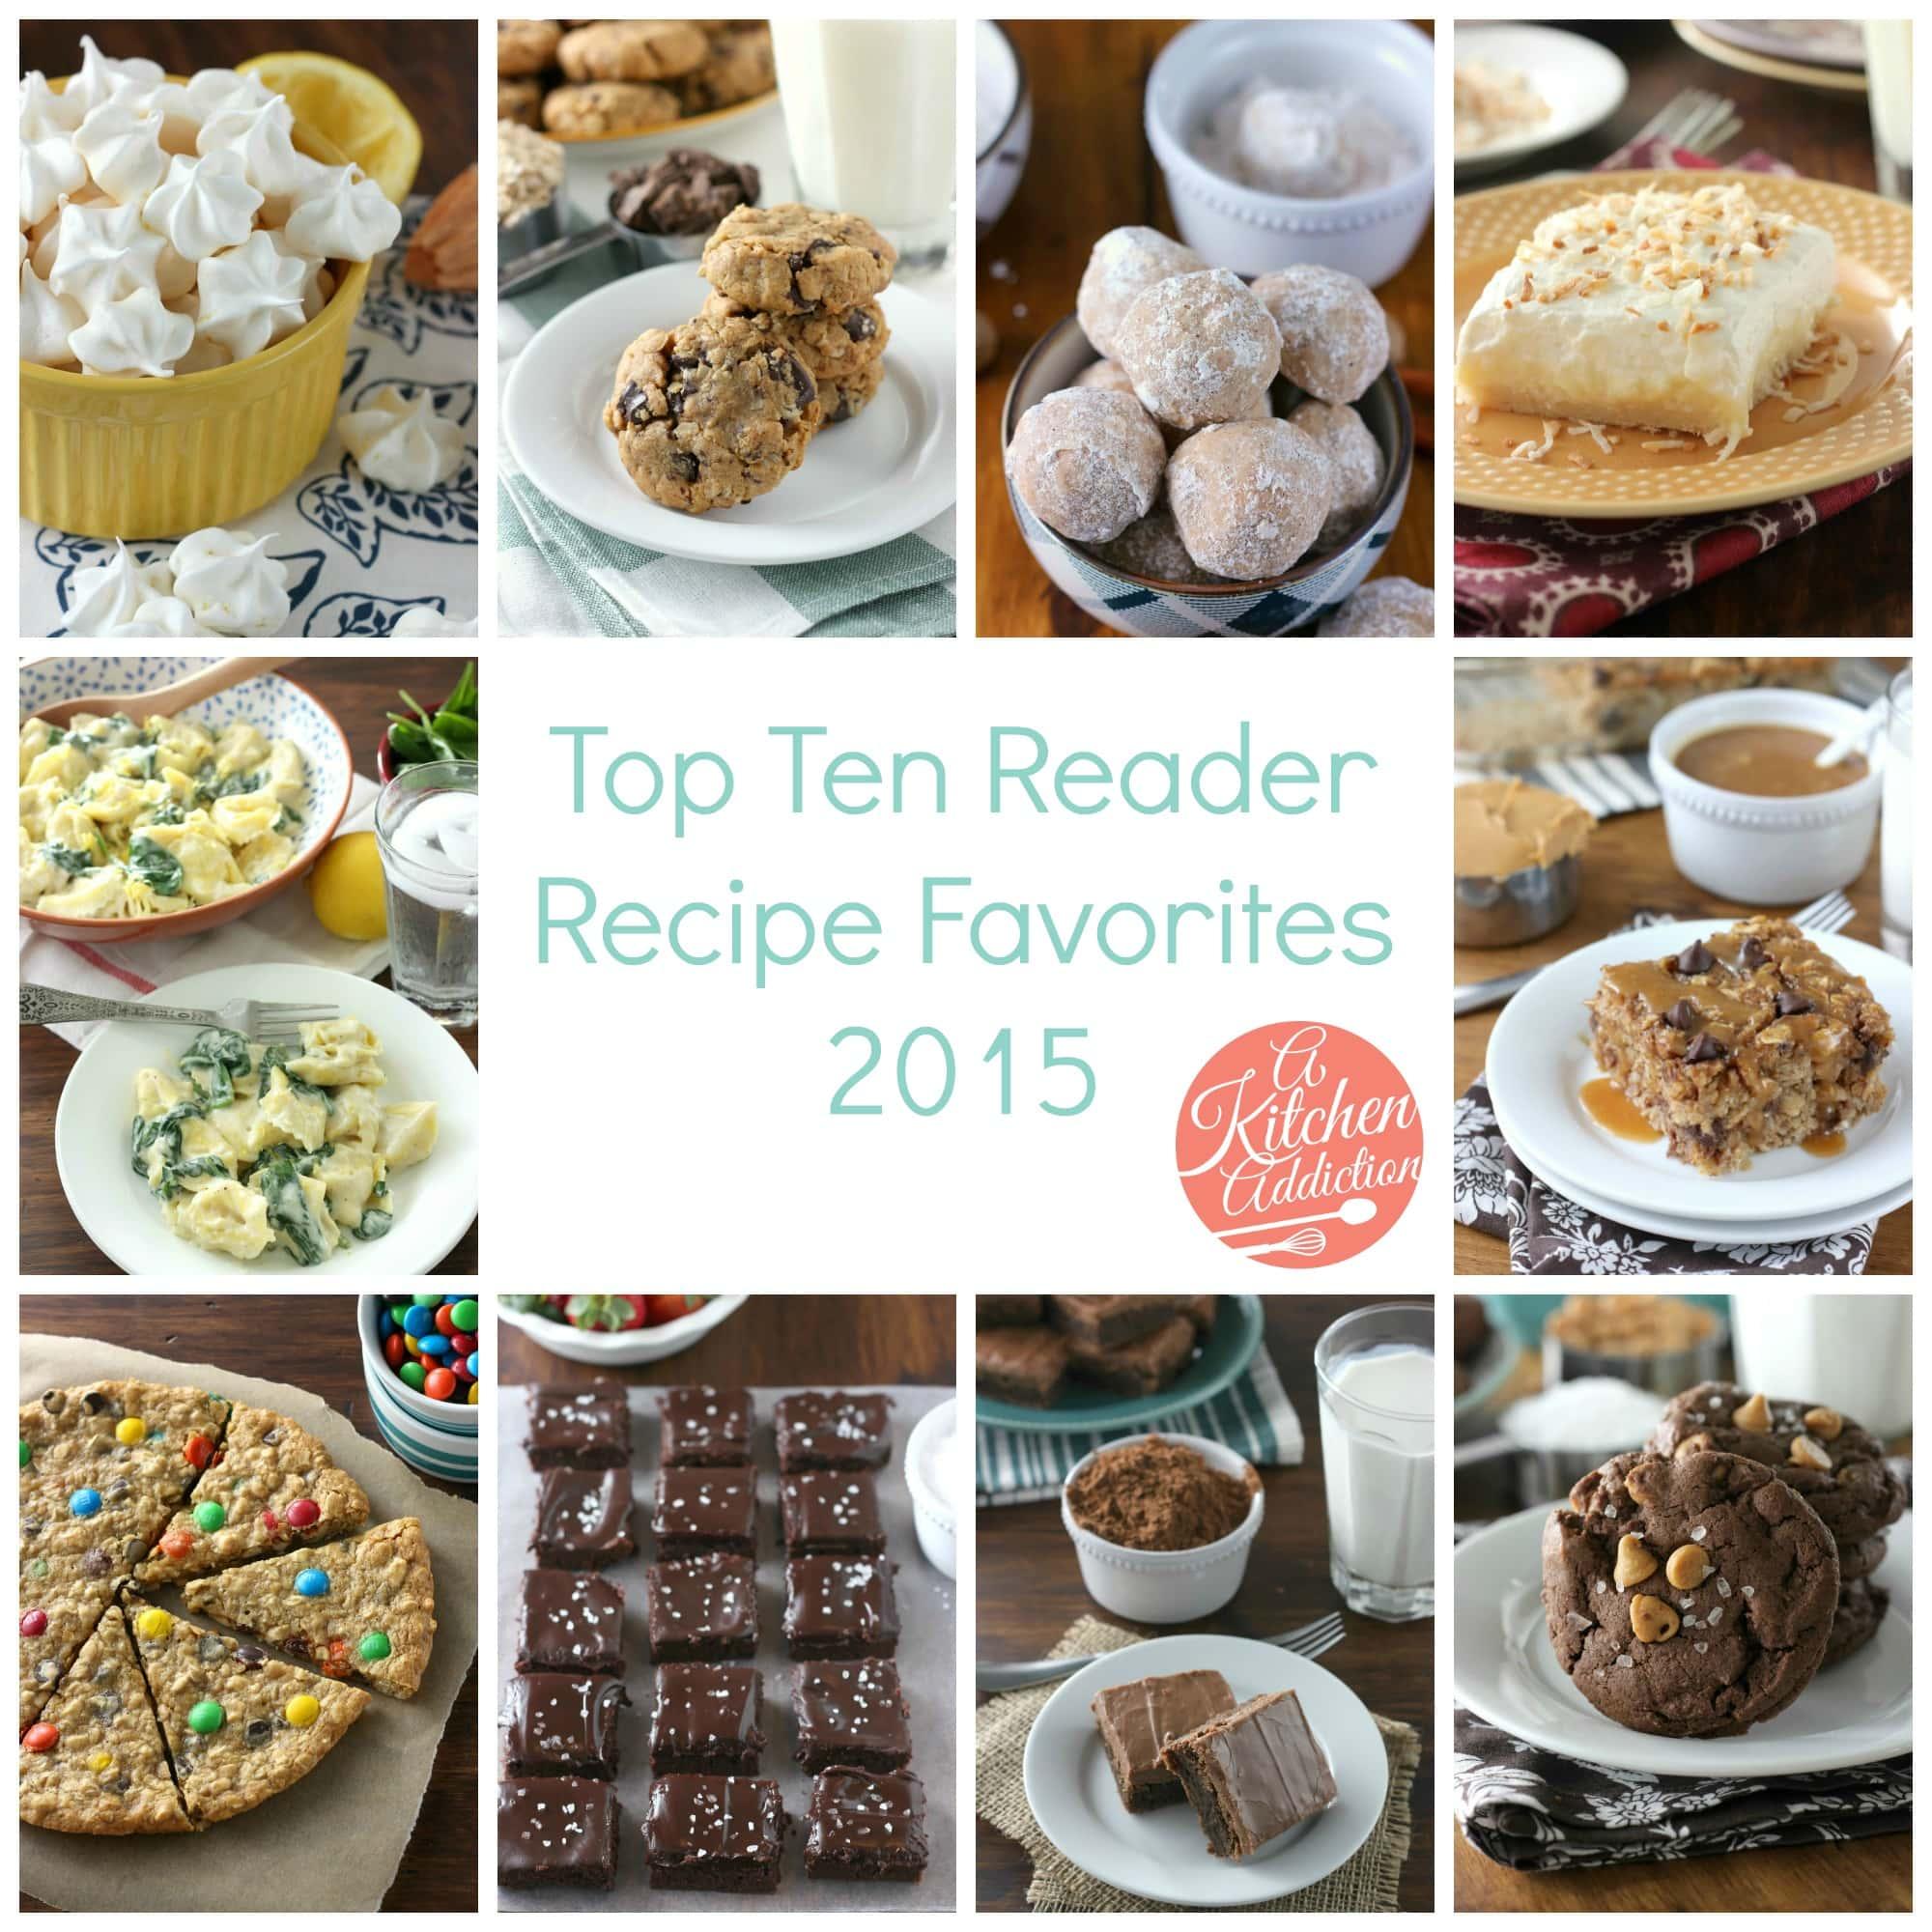 Top Ten Reader Recipe Favorites 2015